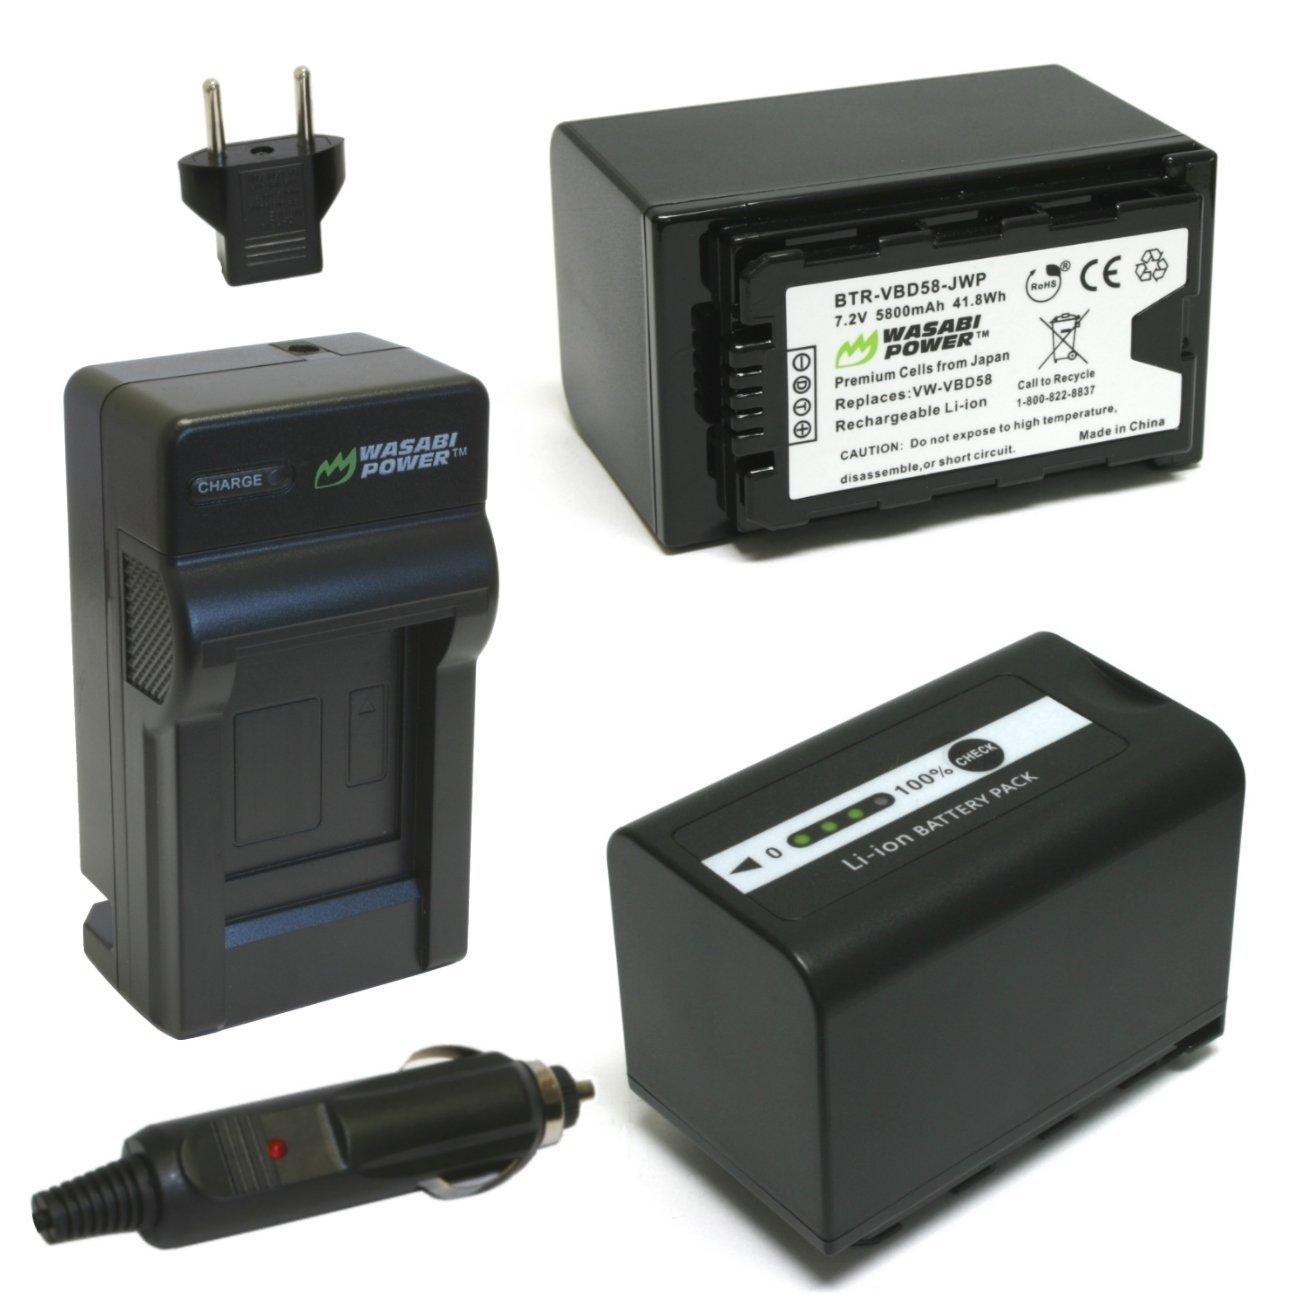 Wasabi Power 5800mAh Battery (2-Pack) and Charger for Panasonic VW-VBD58, AG-VBR89G and Panasonic AG-3DA1, AG-AC8, AG-DVX200, AG-HPX255, AG-HVX201, AJ-PCS060, AJ-PX298, HC-MDH2, HC-X1000, HDC-Z10000